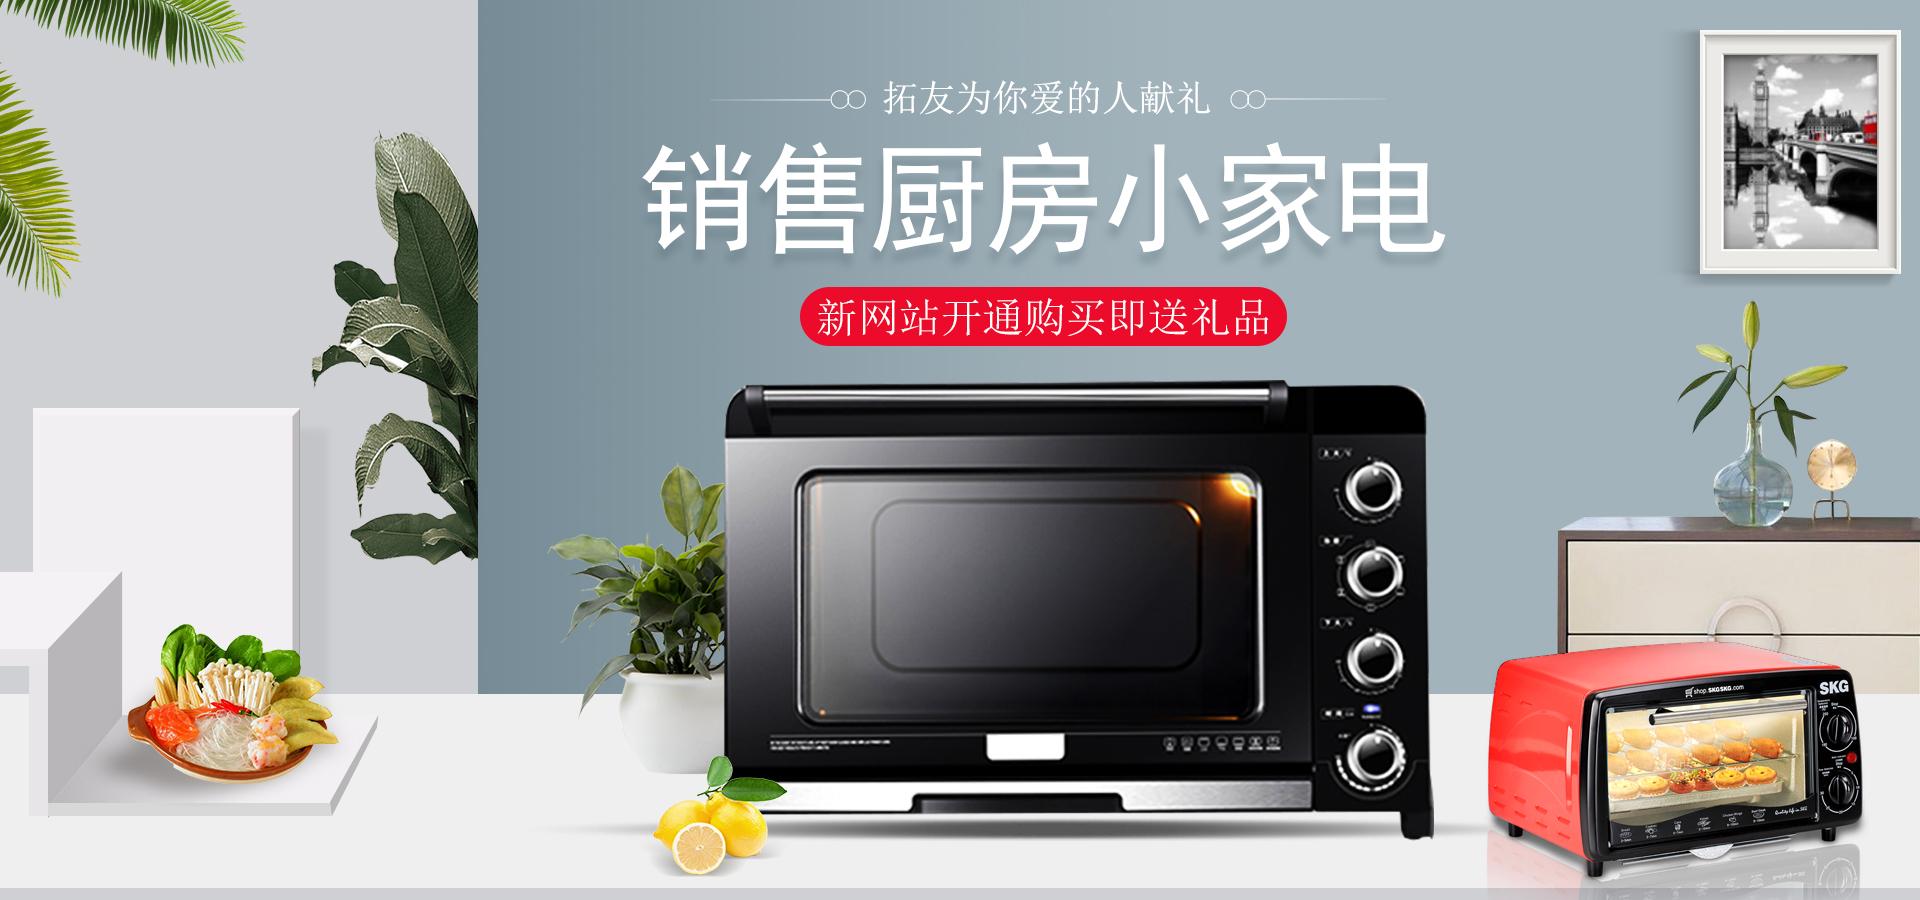 lehu vip家具家工厂  lehu vip厨房电器